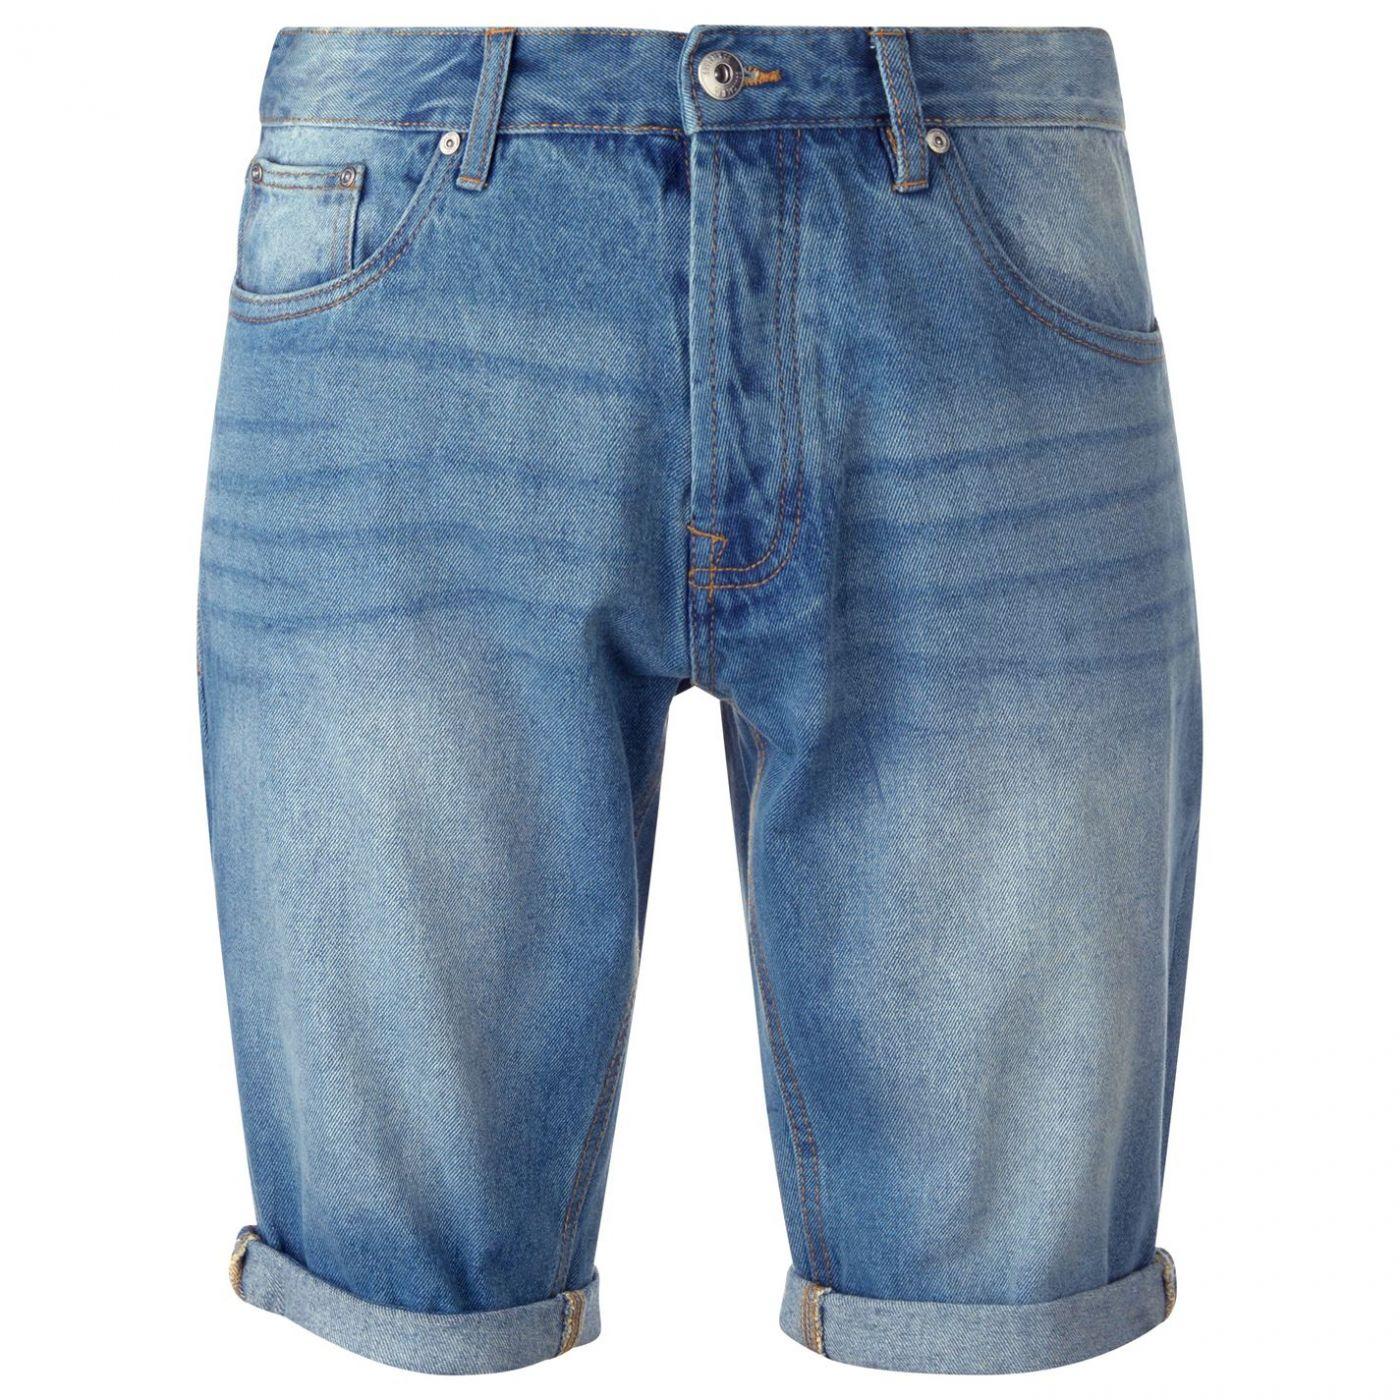 SoulCal Denim Shorts Mens